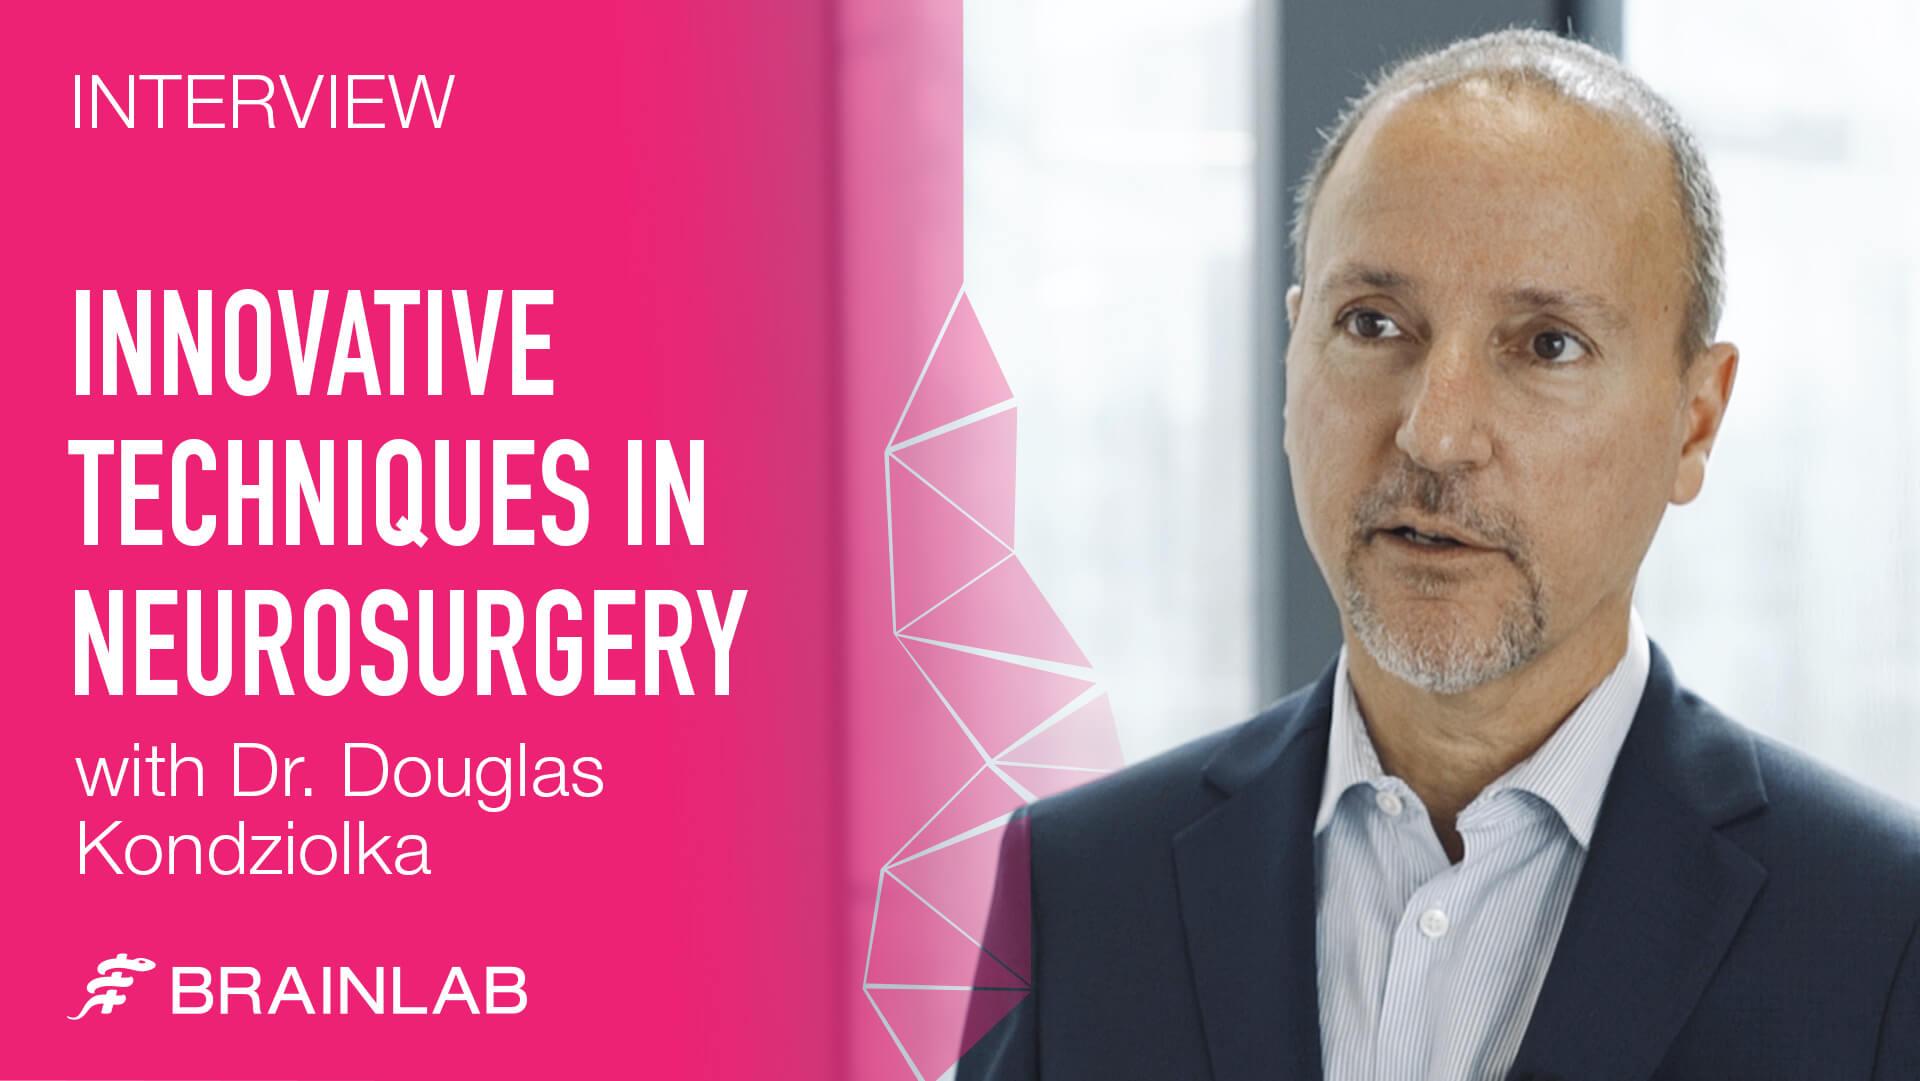 Innovative Techniques in Neurosurgery with Dr. Douglas Kondziolka